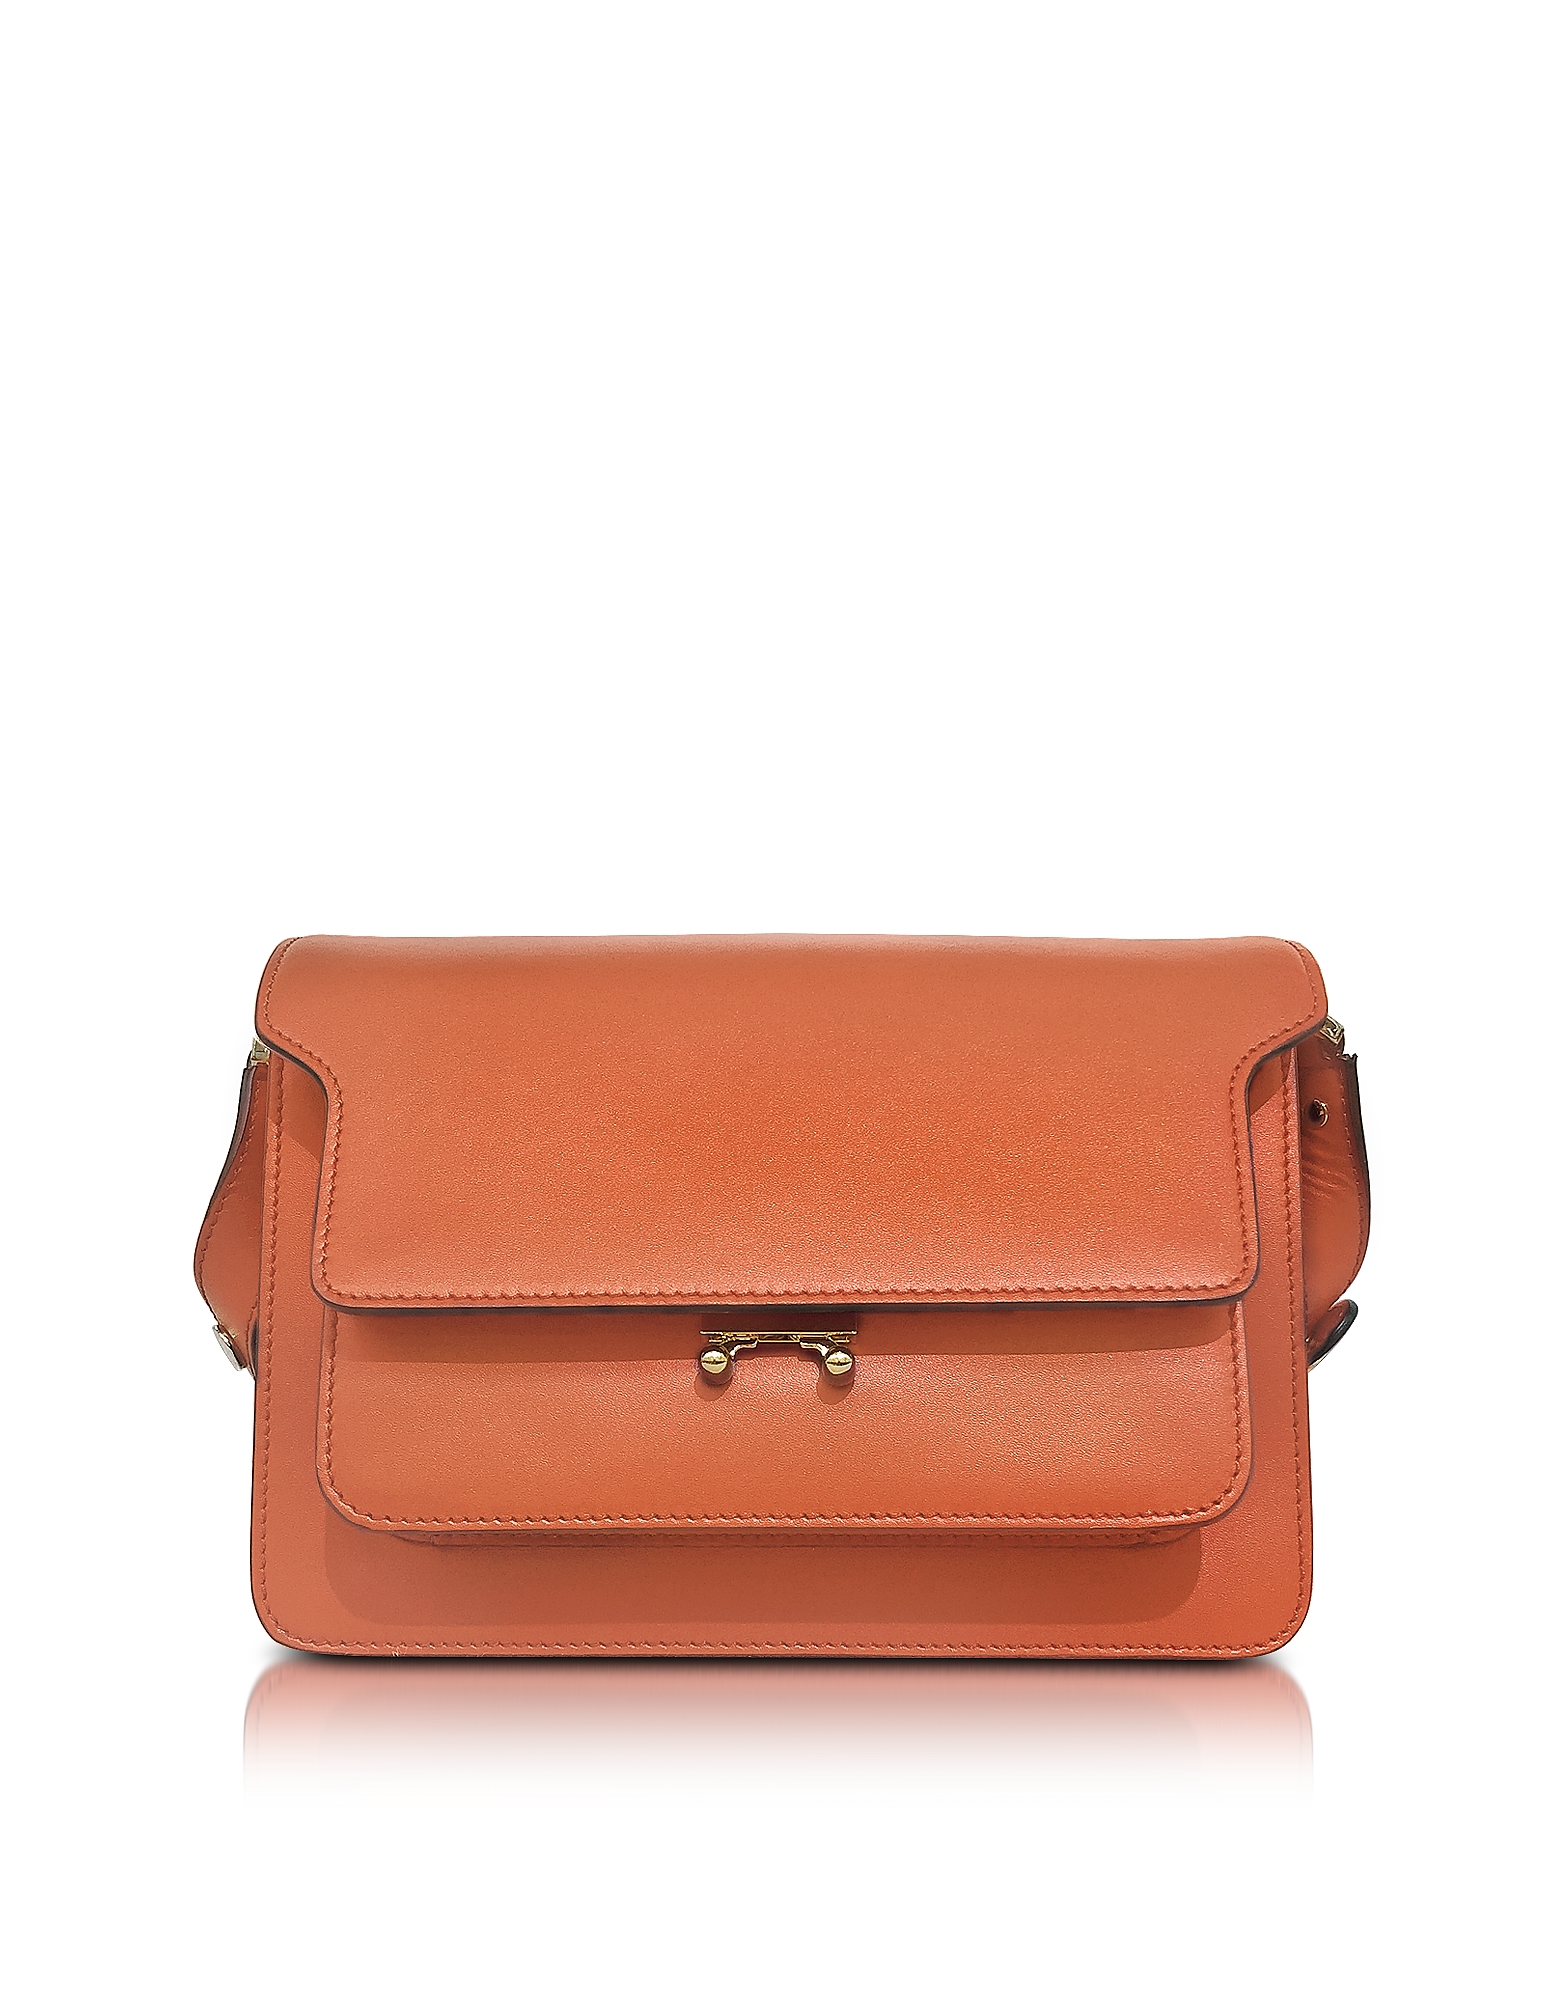 Marni Arabesque Trunk Bag - Оранжевая Кожаная Сумка